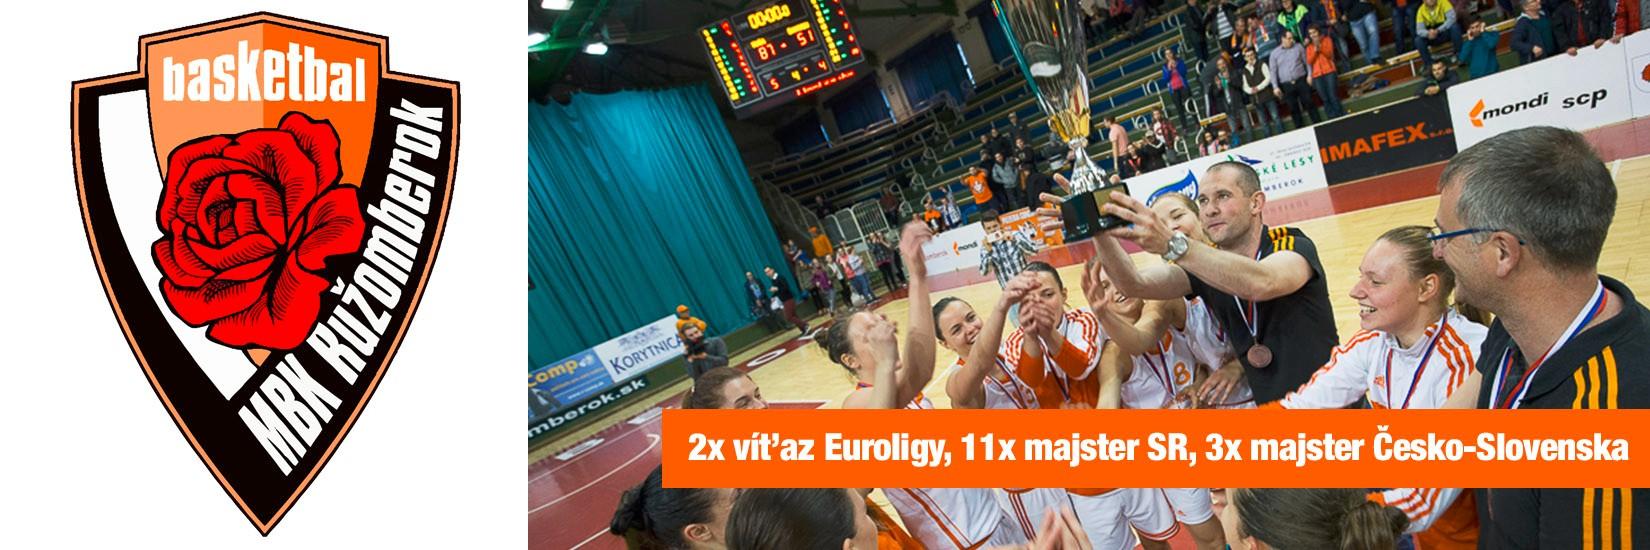 mbk-ruzomberok-top-banner-19-06-16-1